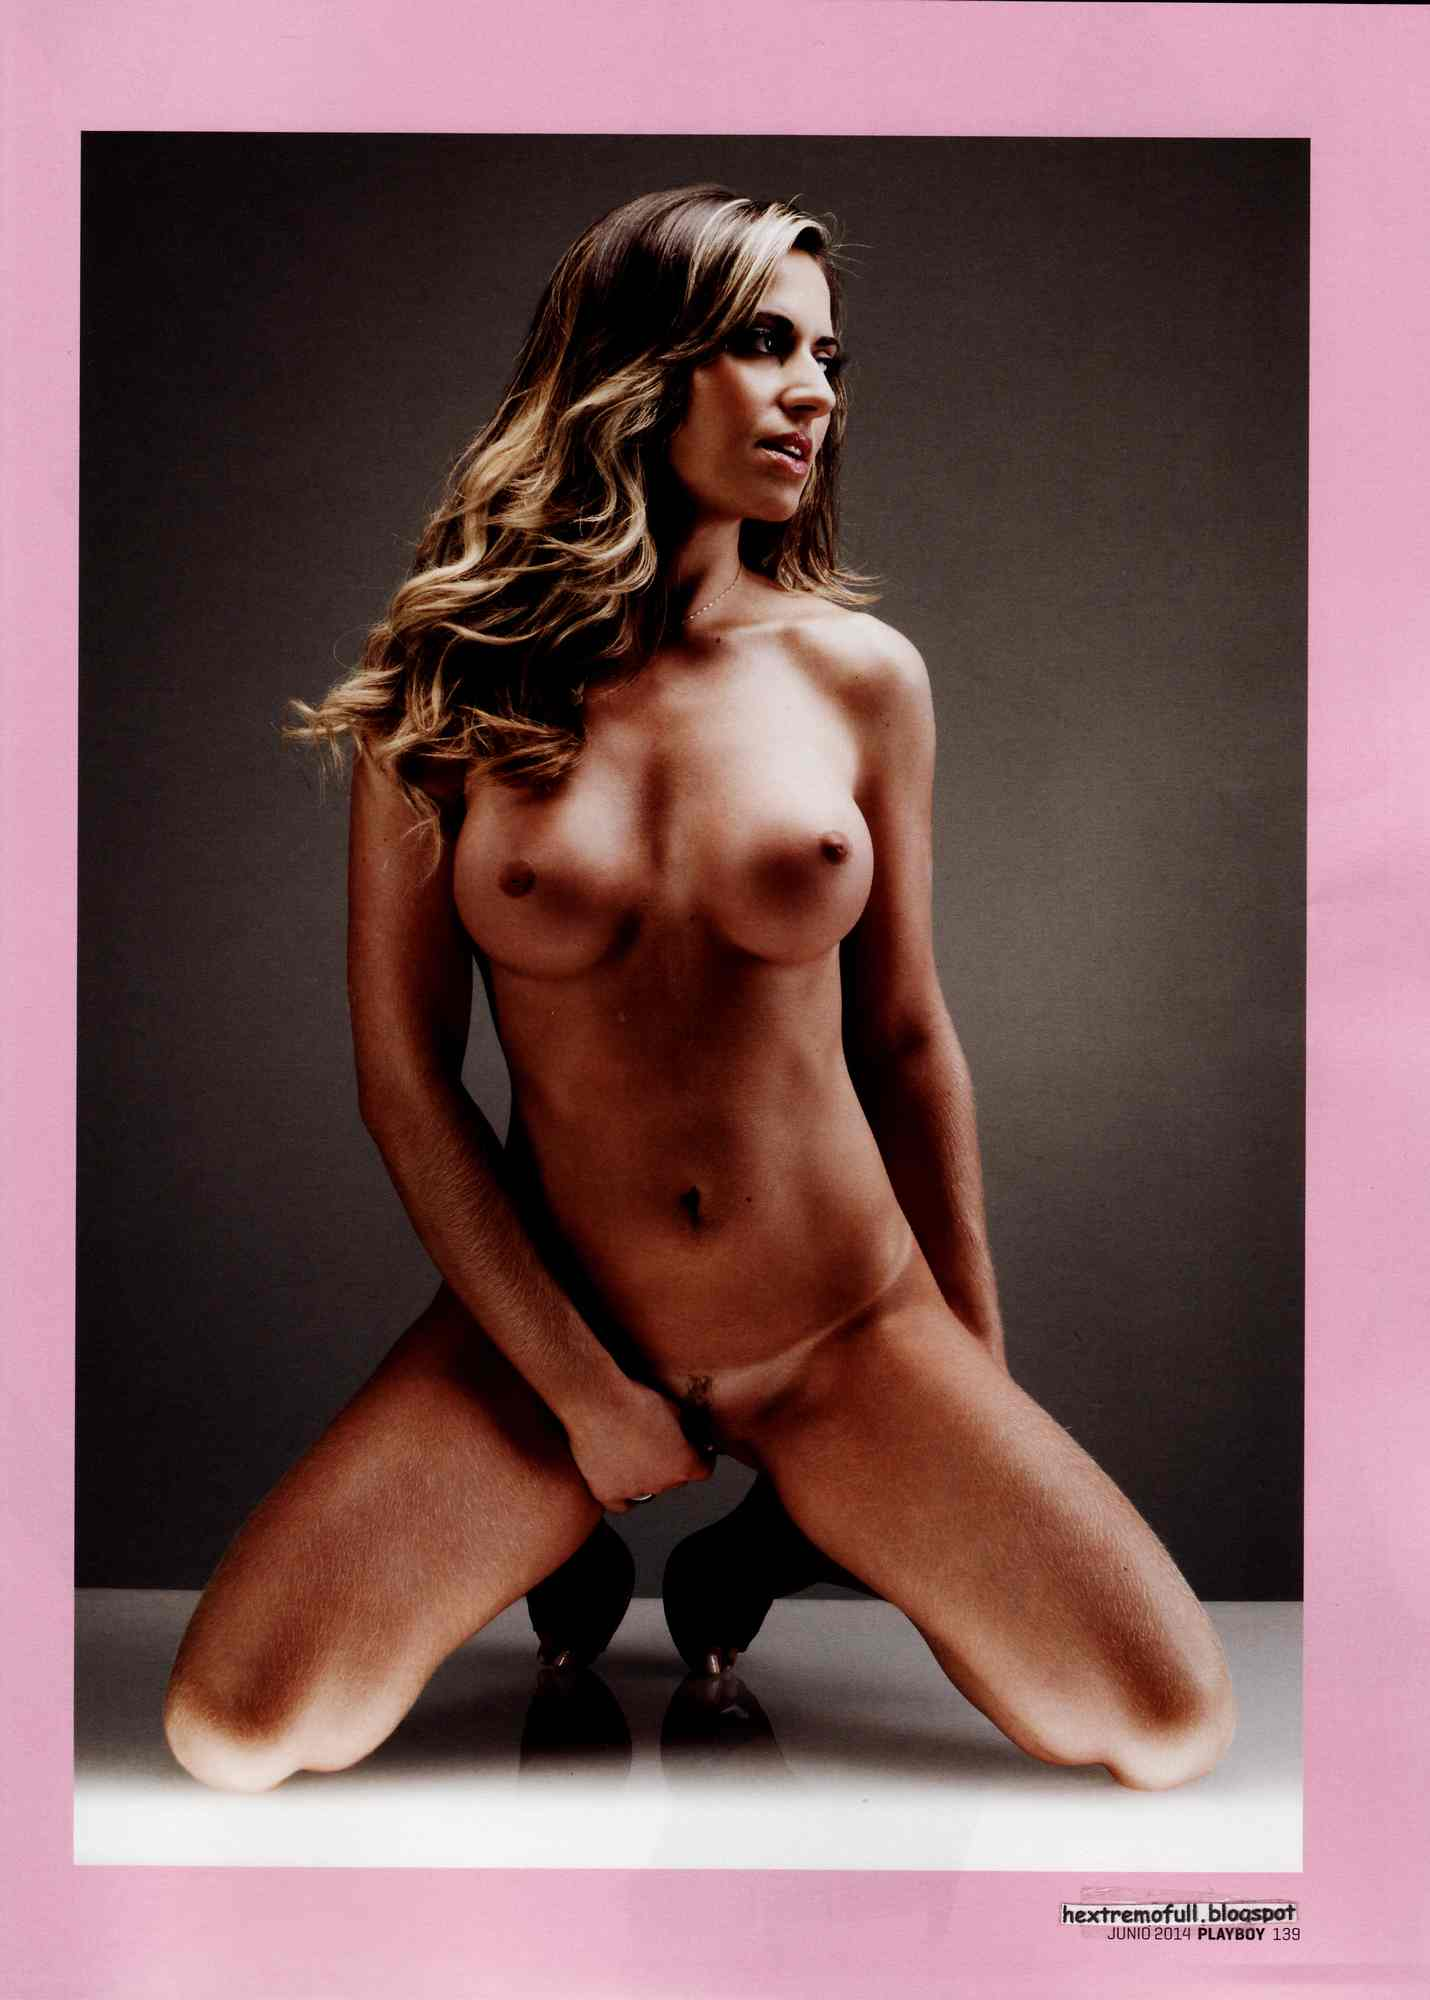 Adriana vega el sexo sentido - 1 part 4